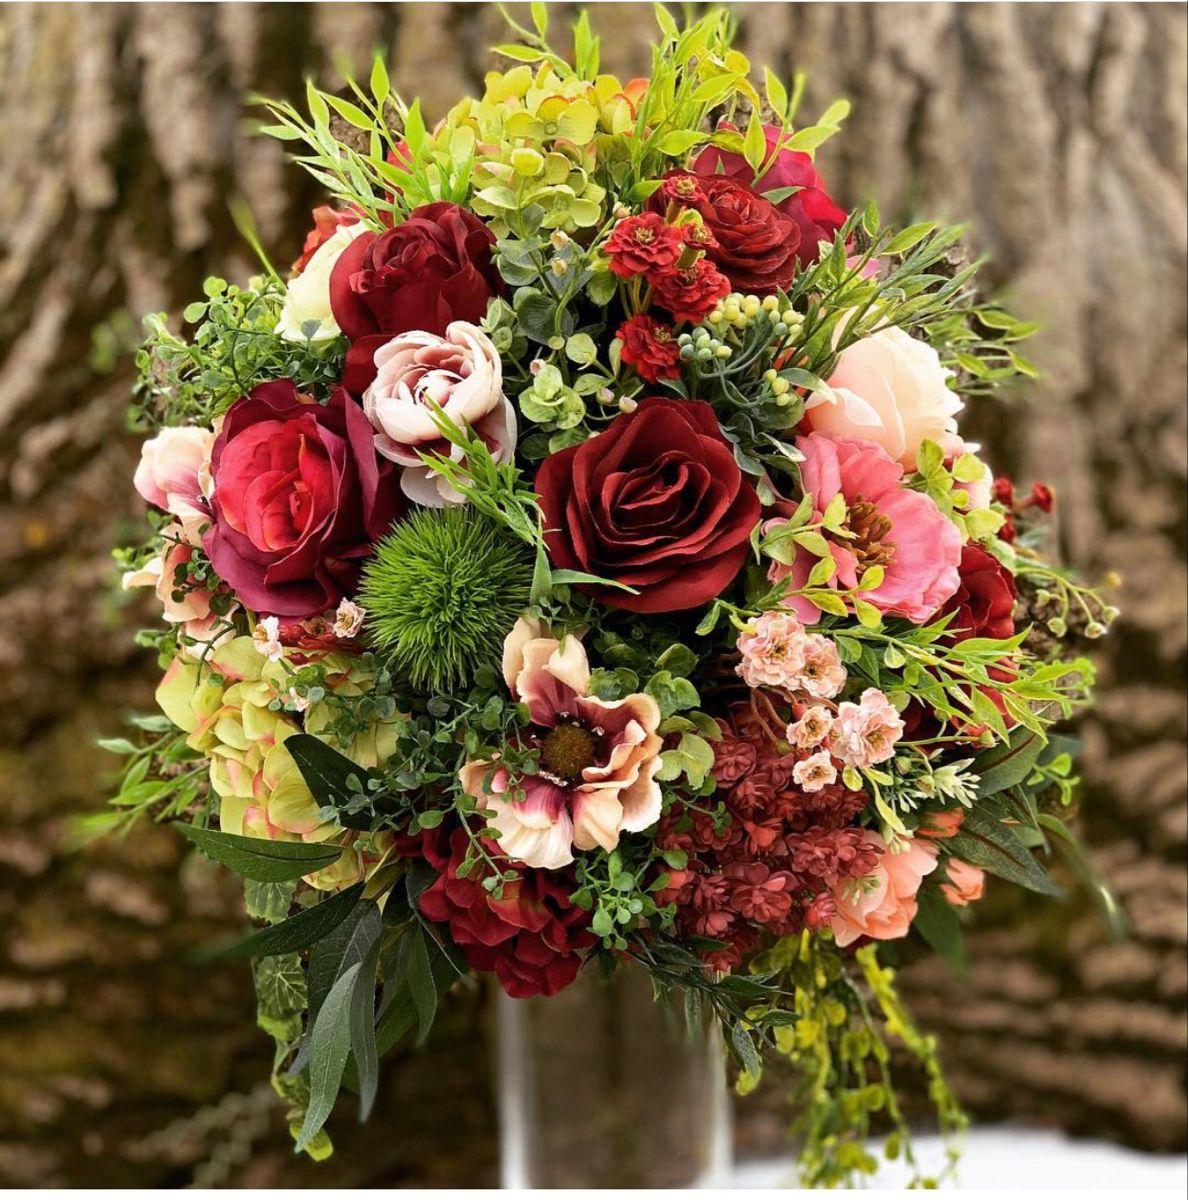 Burgundy Flowers in 2020 Burgundy wedding flowers